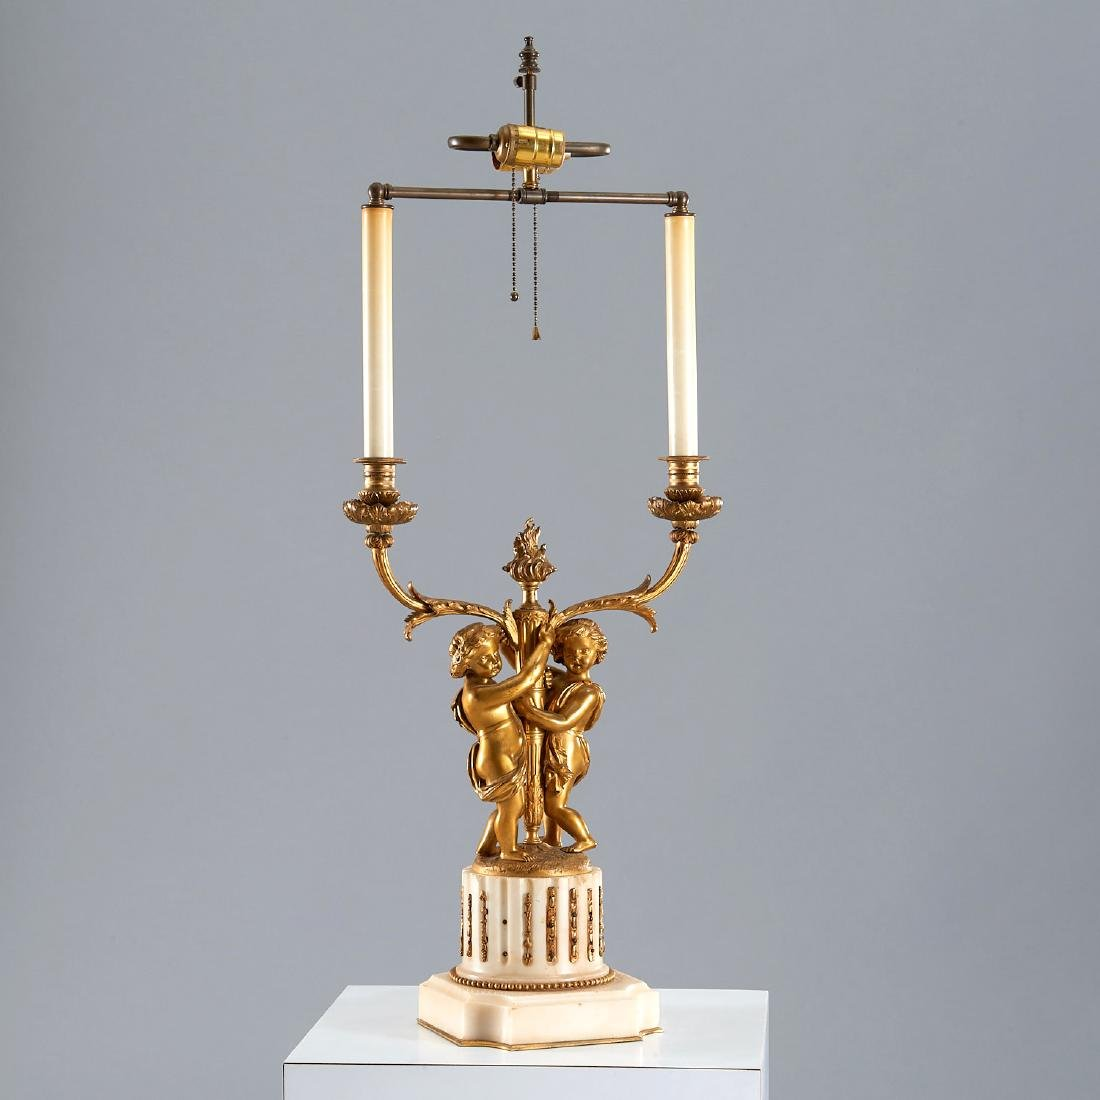 Neoclassical Gilt Bronze & Steel Candelabrum Lamp